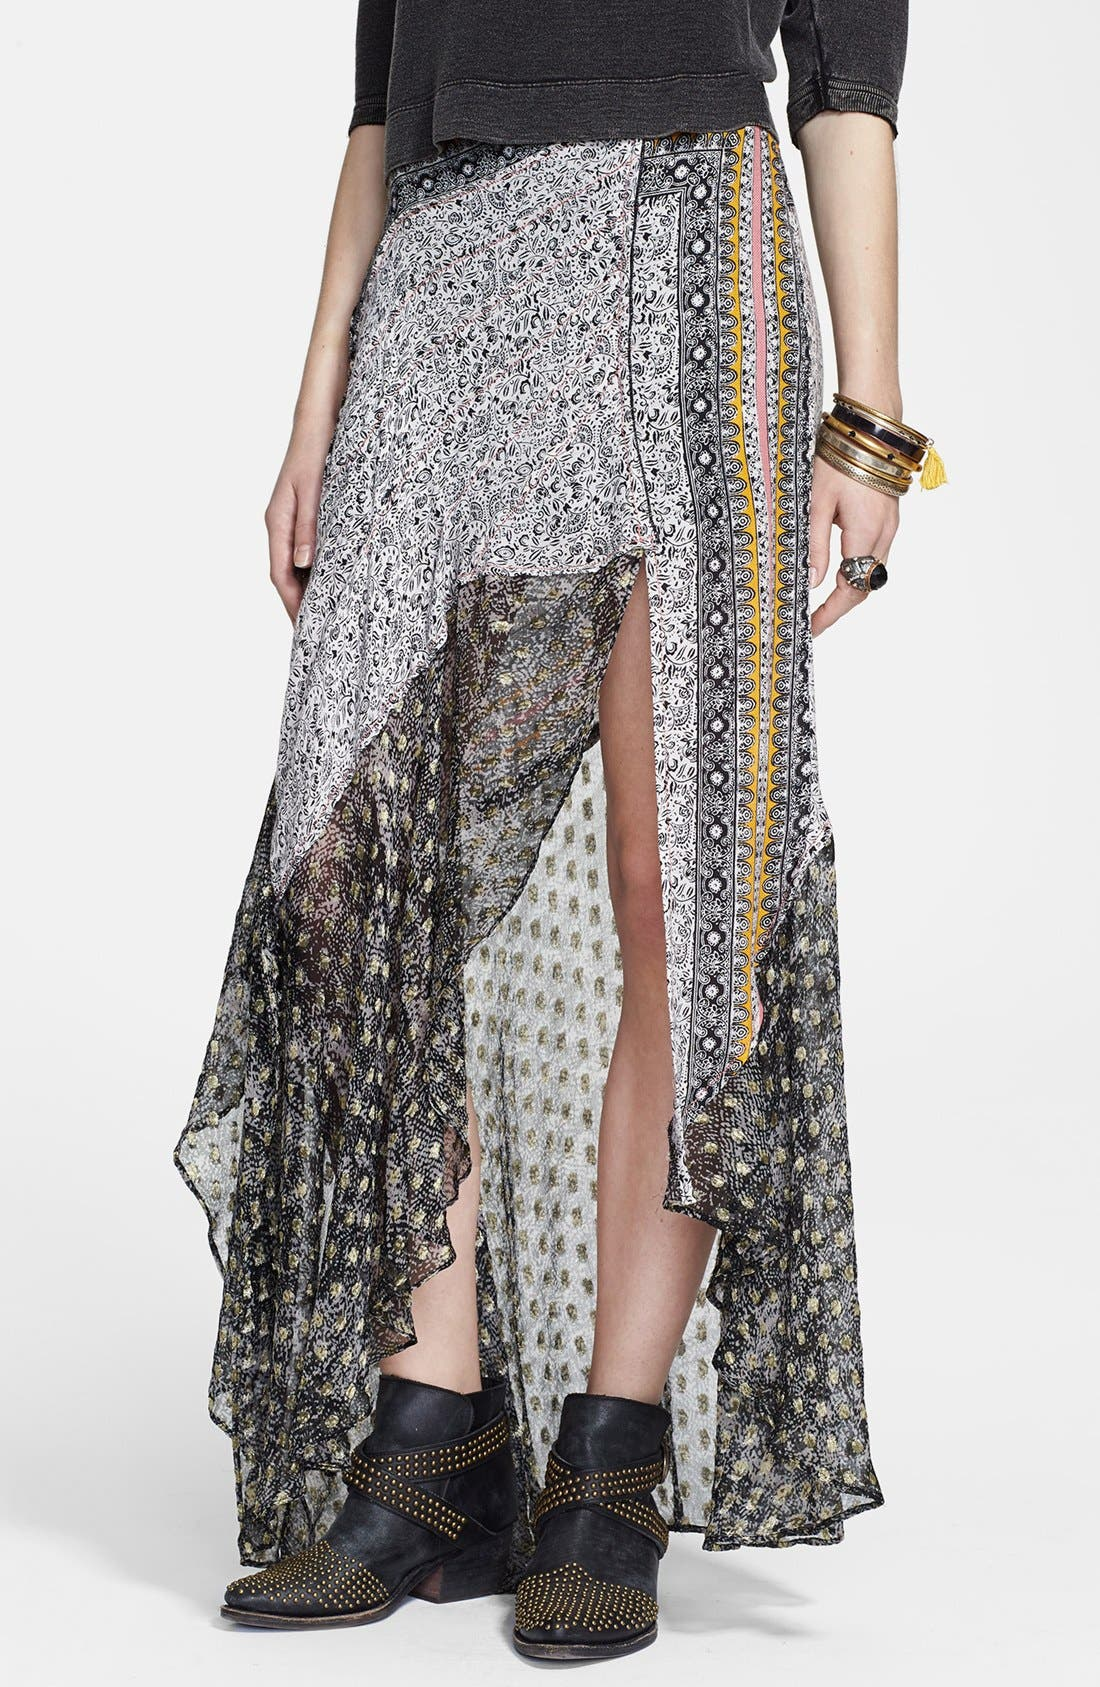 Alternate Image 1 Selected - Free People Asymmetrical Mixed Print Ruffle Skirt